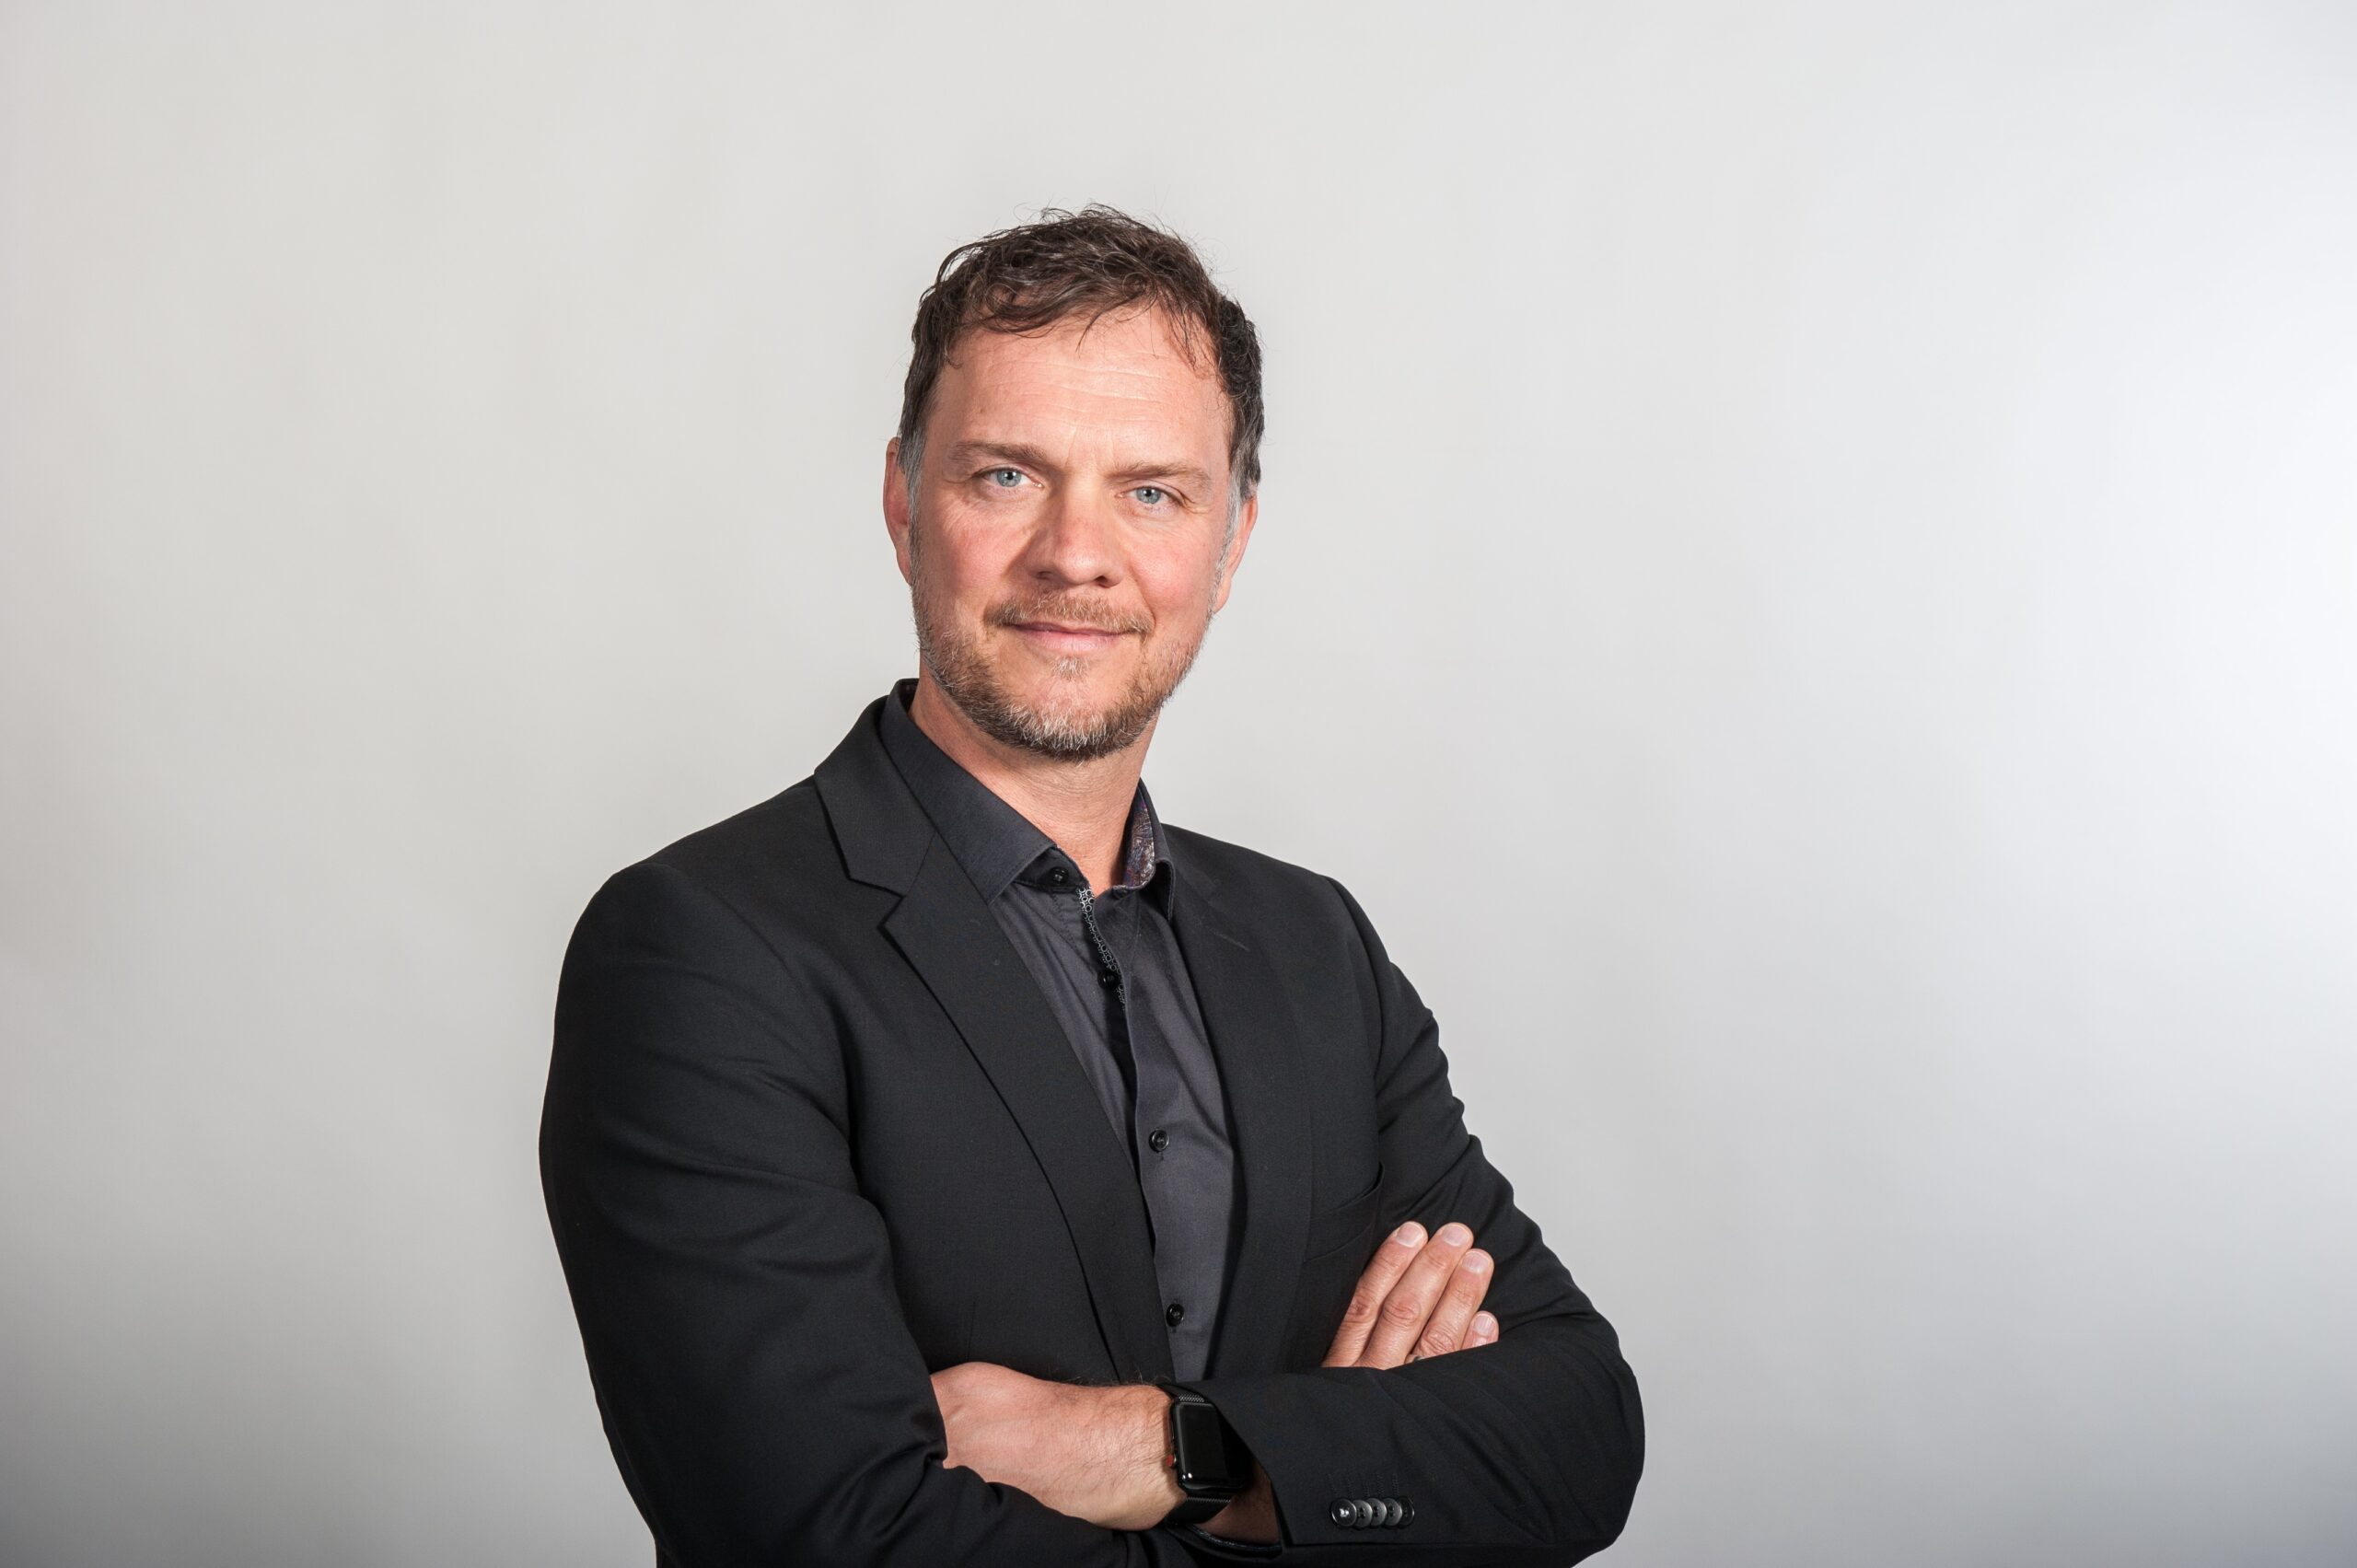 Prof. Dr. Volker Busch